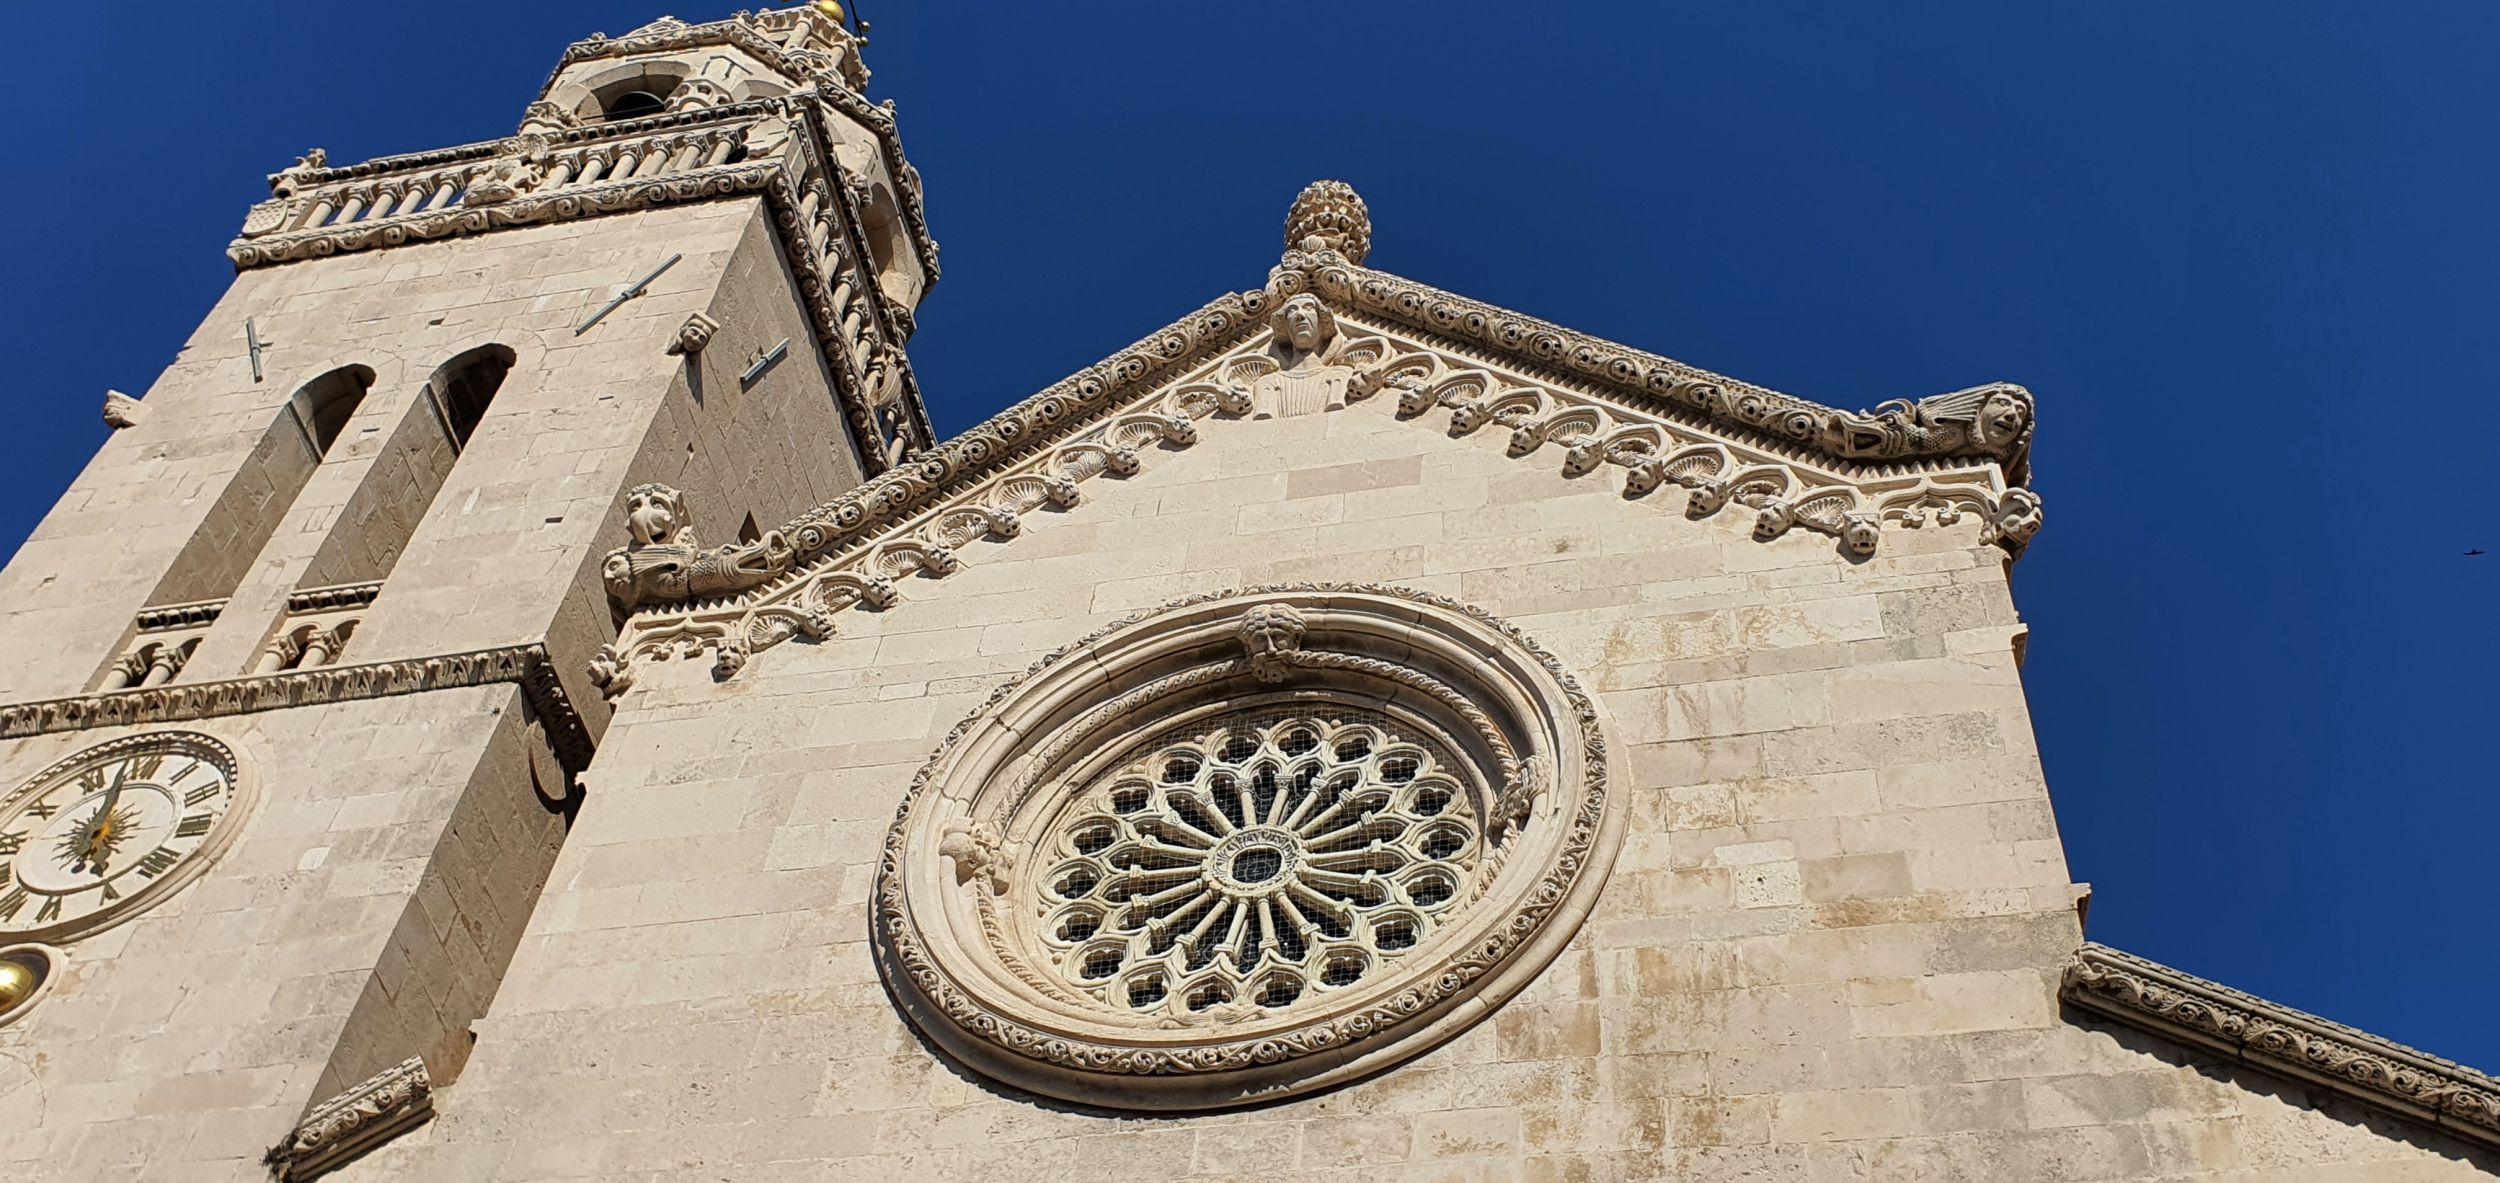 Korčula cathedral of Saint Mark, Korčula, Croatia, photo by croatia2go.com